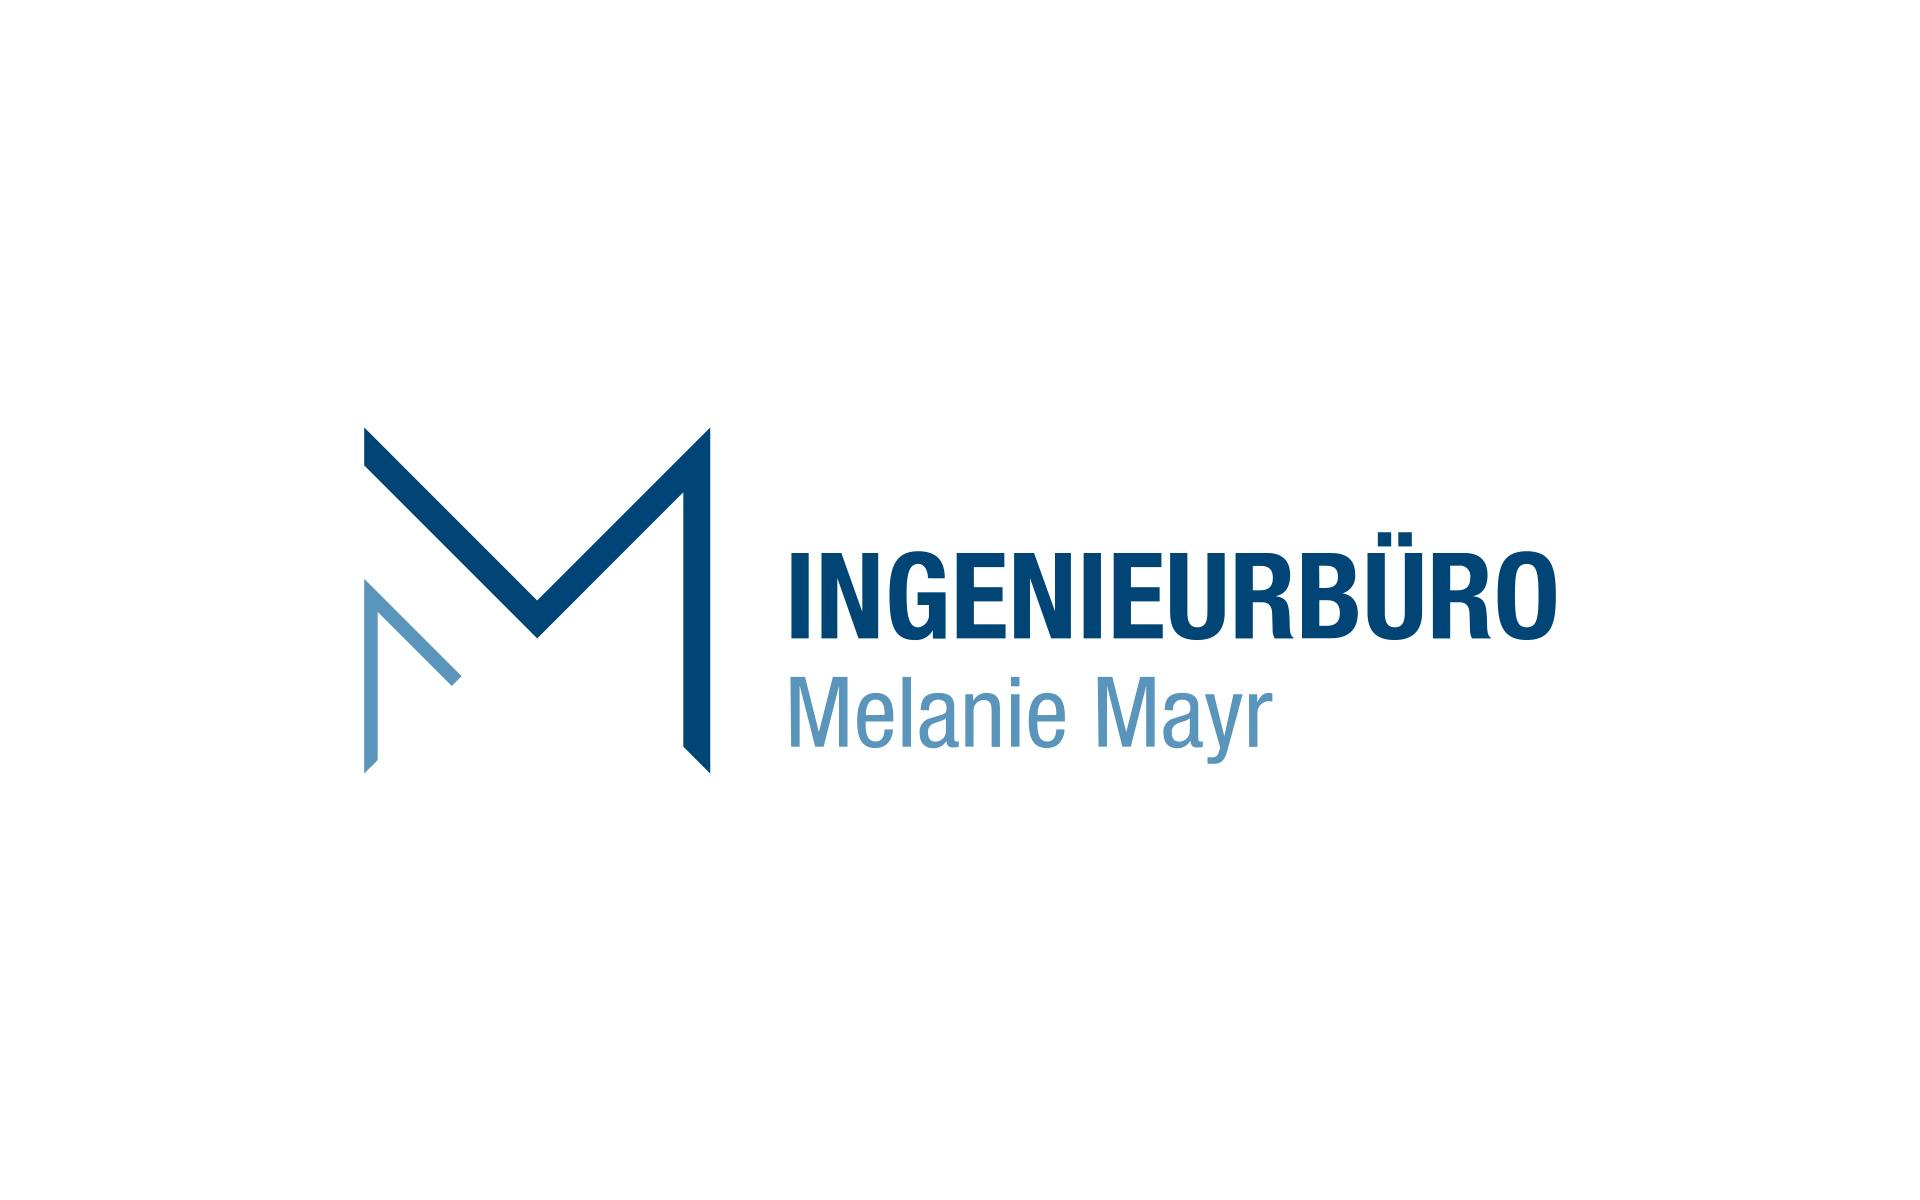 maxfath-ingenieurbuero-melanie-mayr-mering-branding-logo-horizontal